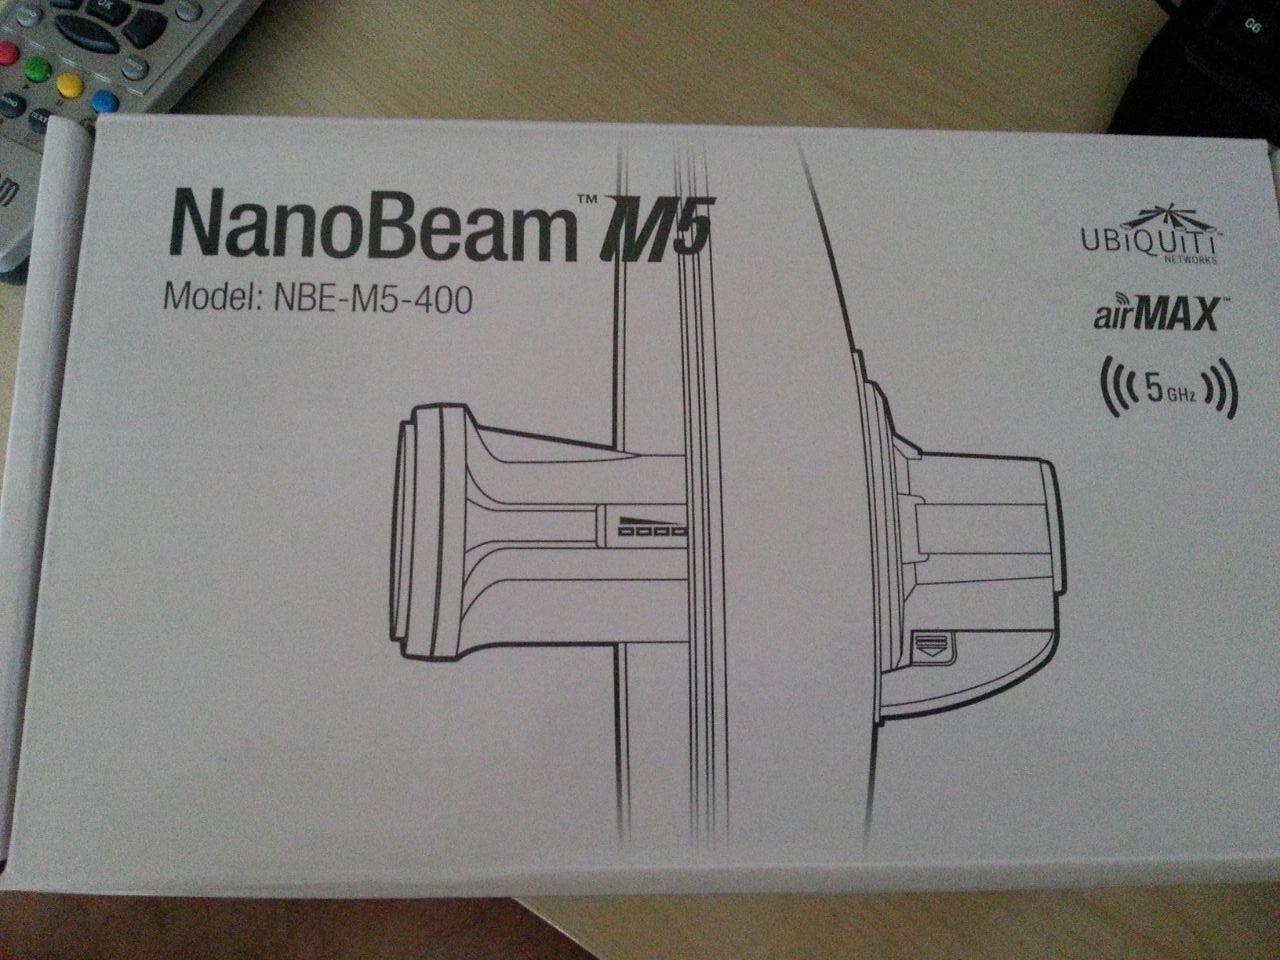 NanoBeam M5 - Welche Firmware? - Hardware - Freifunk Forum